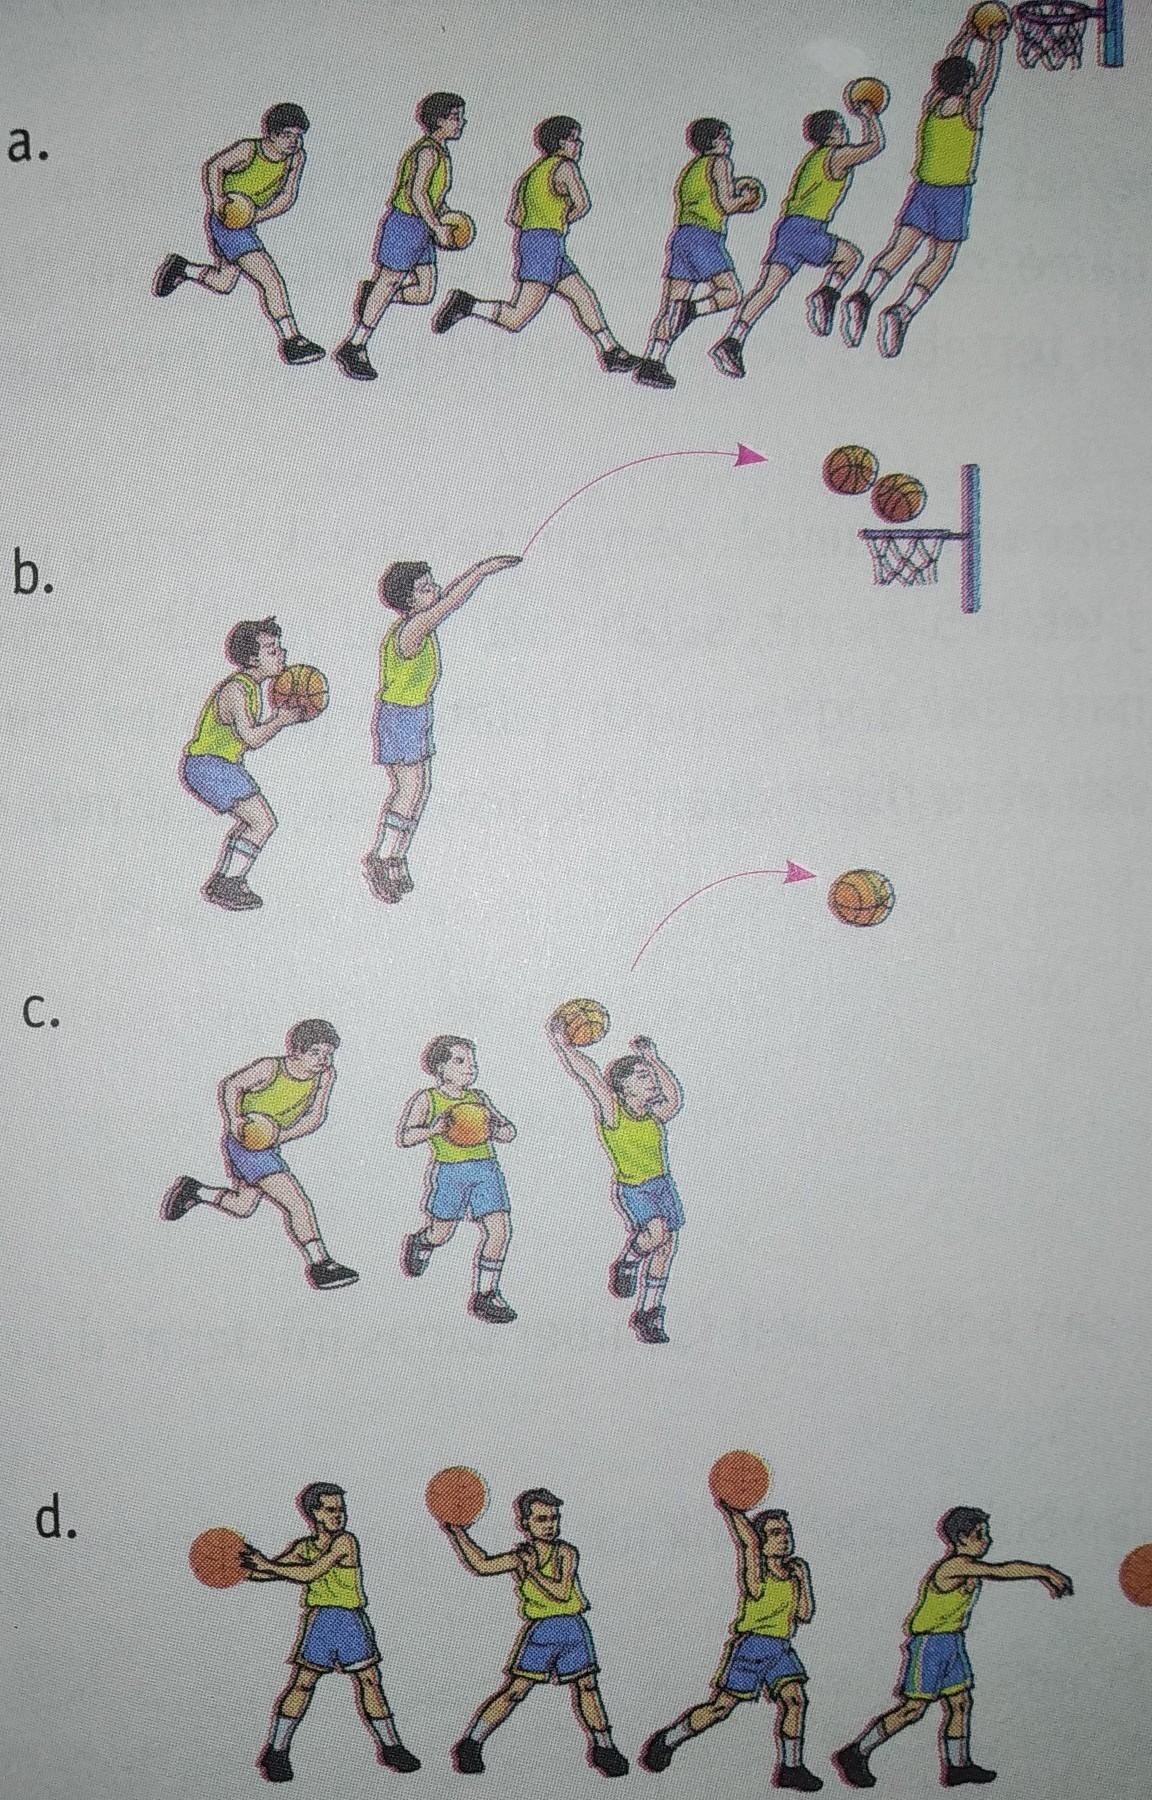 Latihan Menembak Sambil Melayang Dalam Permainan Bola Basket Disebut : latihan, menembak, sambil, melayang, dalam, permainan, basket, disebut, Dalam, Basket, Teknik, Menembak, Sambil, Melayang, Dinamakan